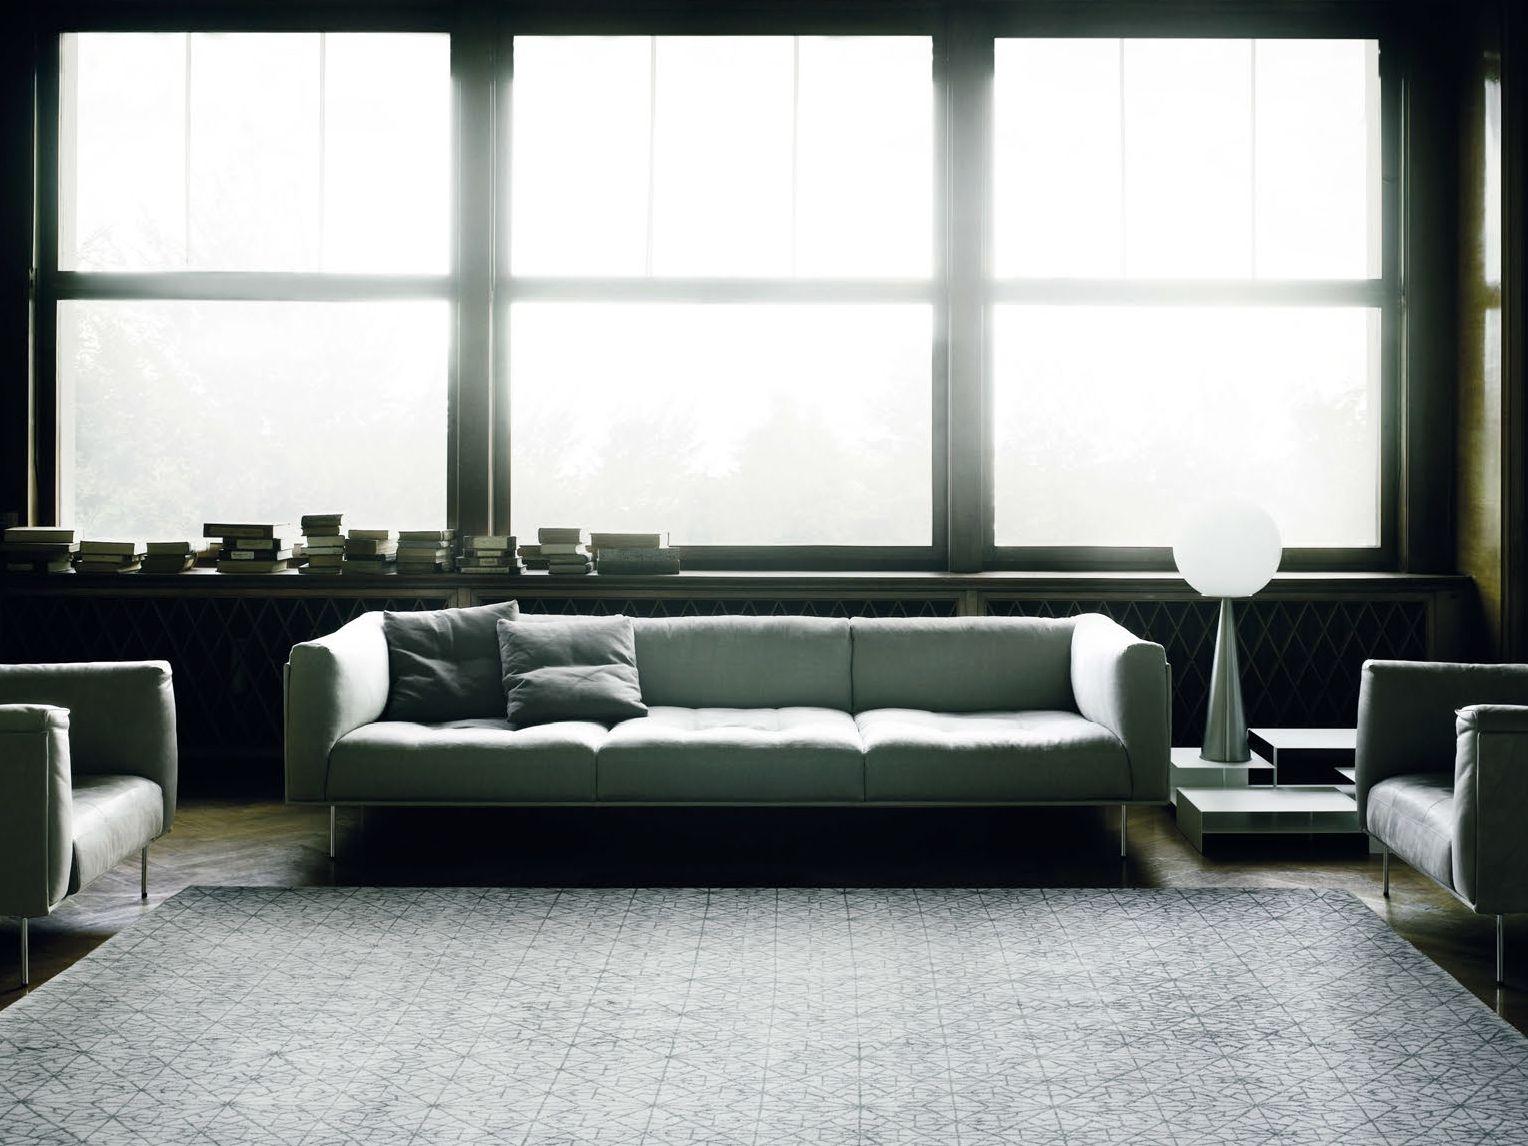 sofa rod xl by living divani design piero lissoni. Black Bedroom Furniture Sets. Home Design Ideas